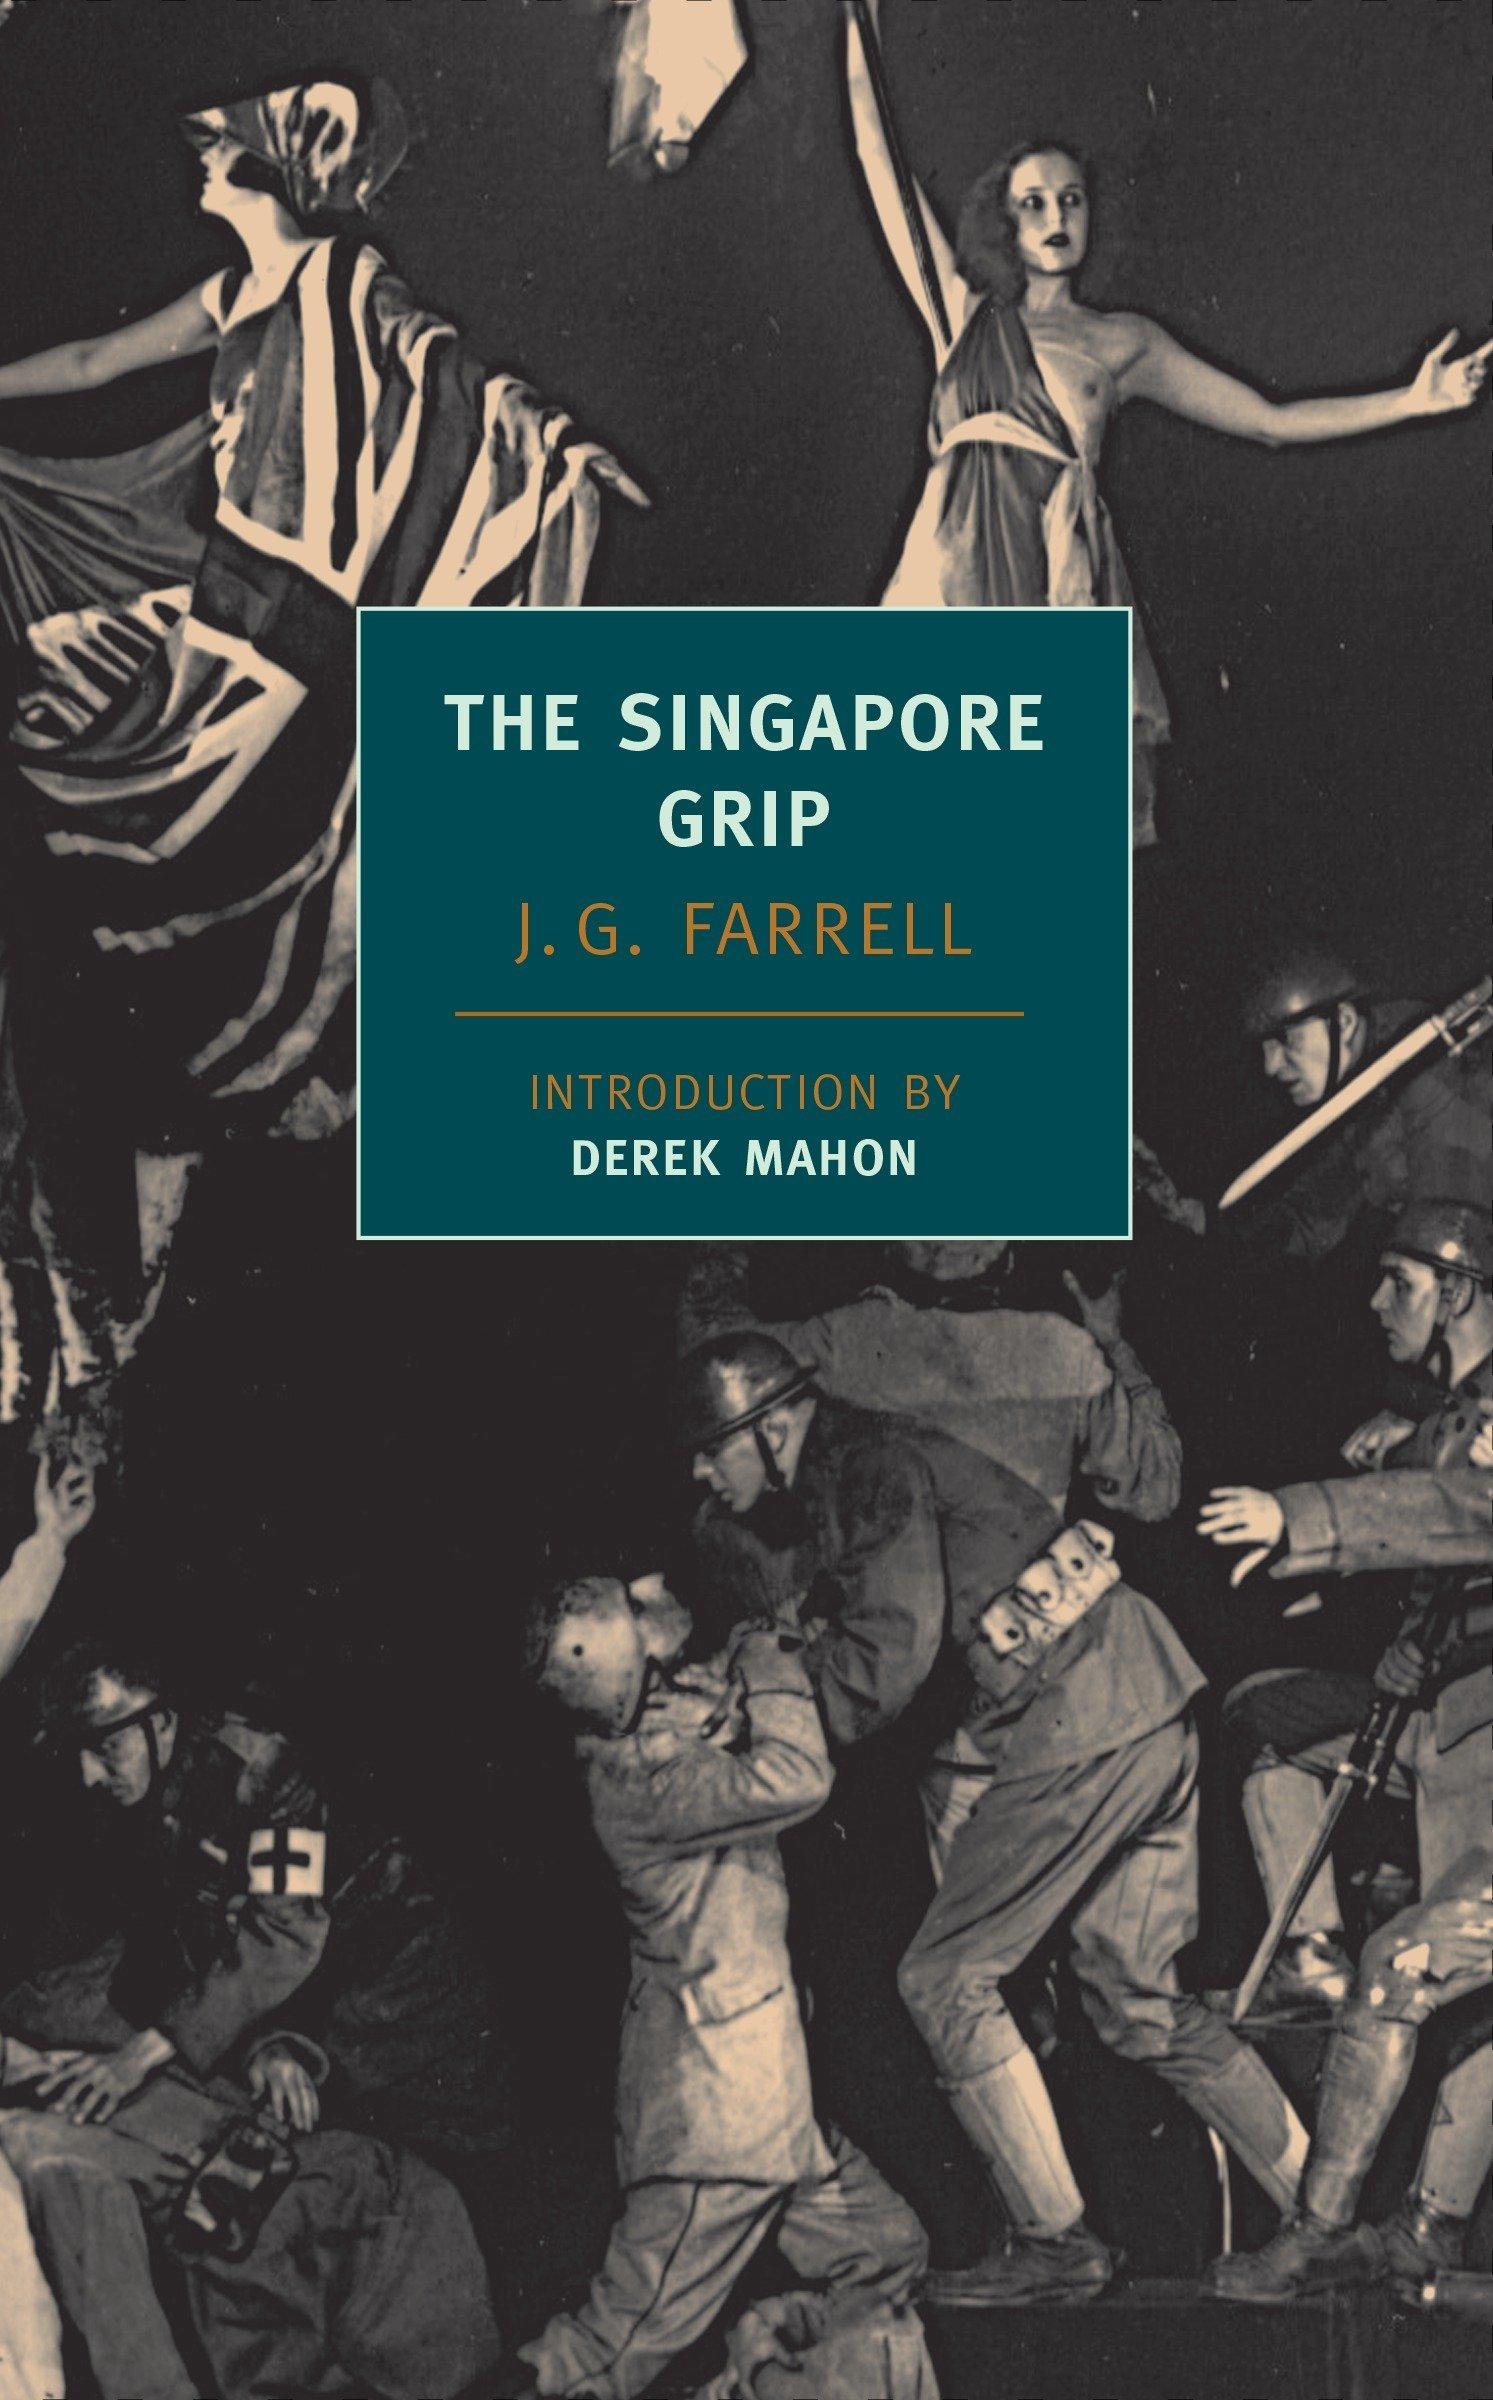 Amazon.com: The Singapore Grip (Empire Trilogy) (9781590171363): Farrell,  J.G., Mahon, Derek: Books